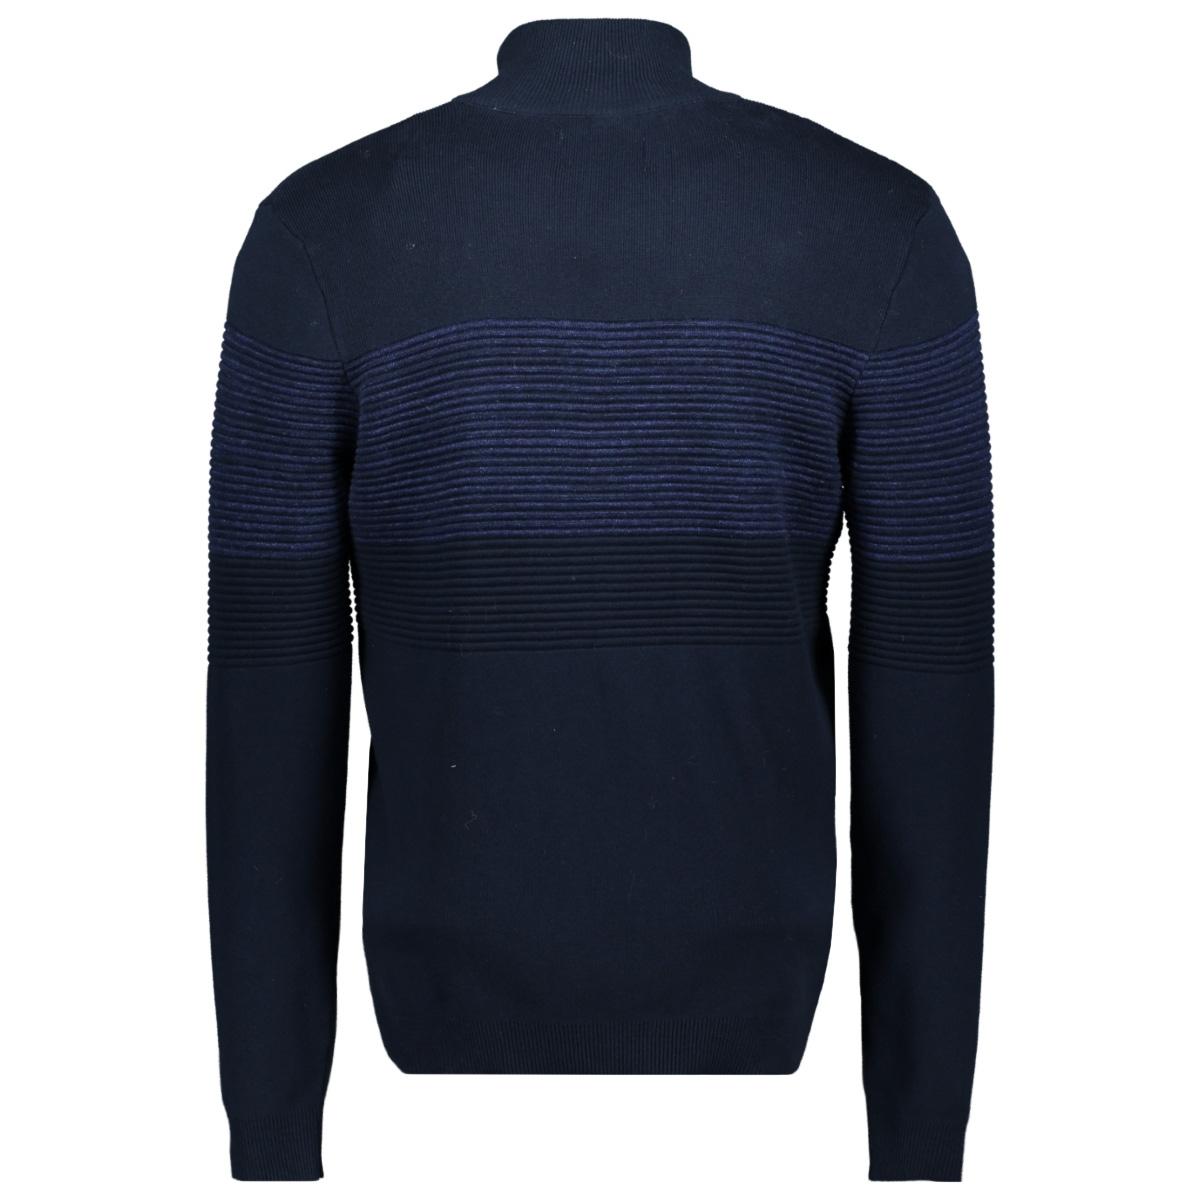 jcoshield knit cardigan 12163346 jack & jones vest sky captain